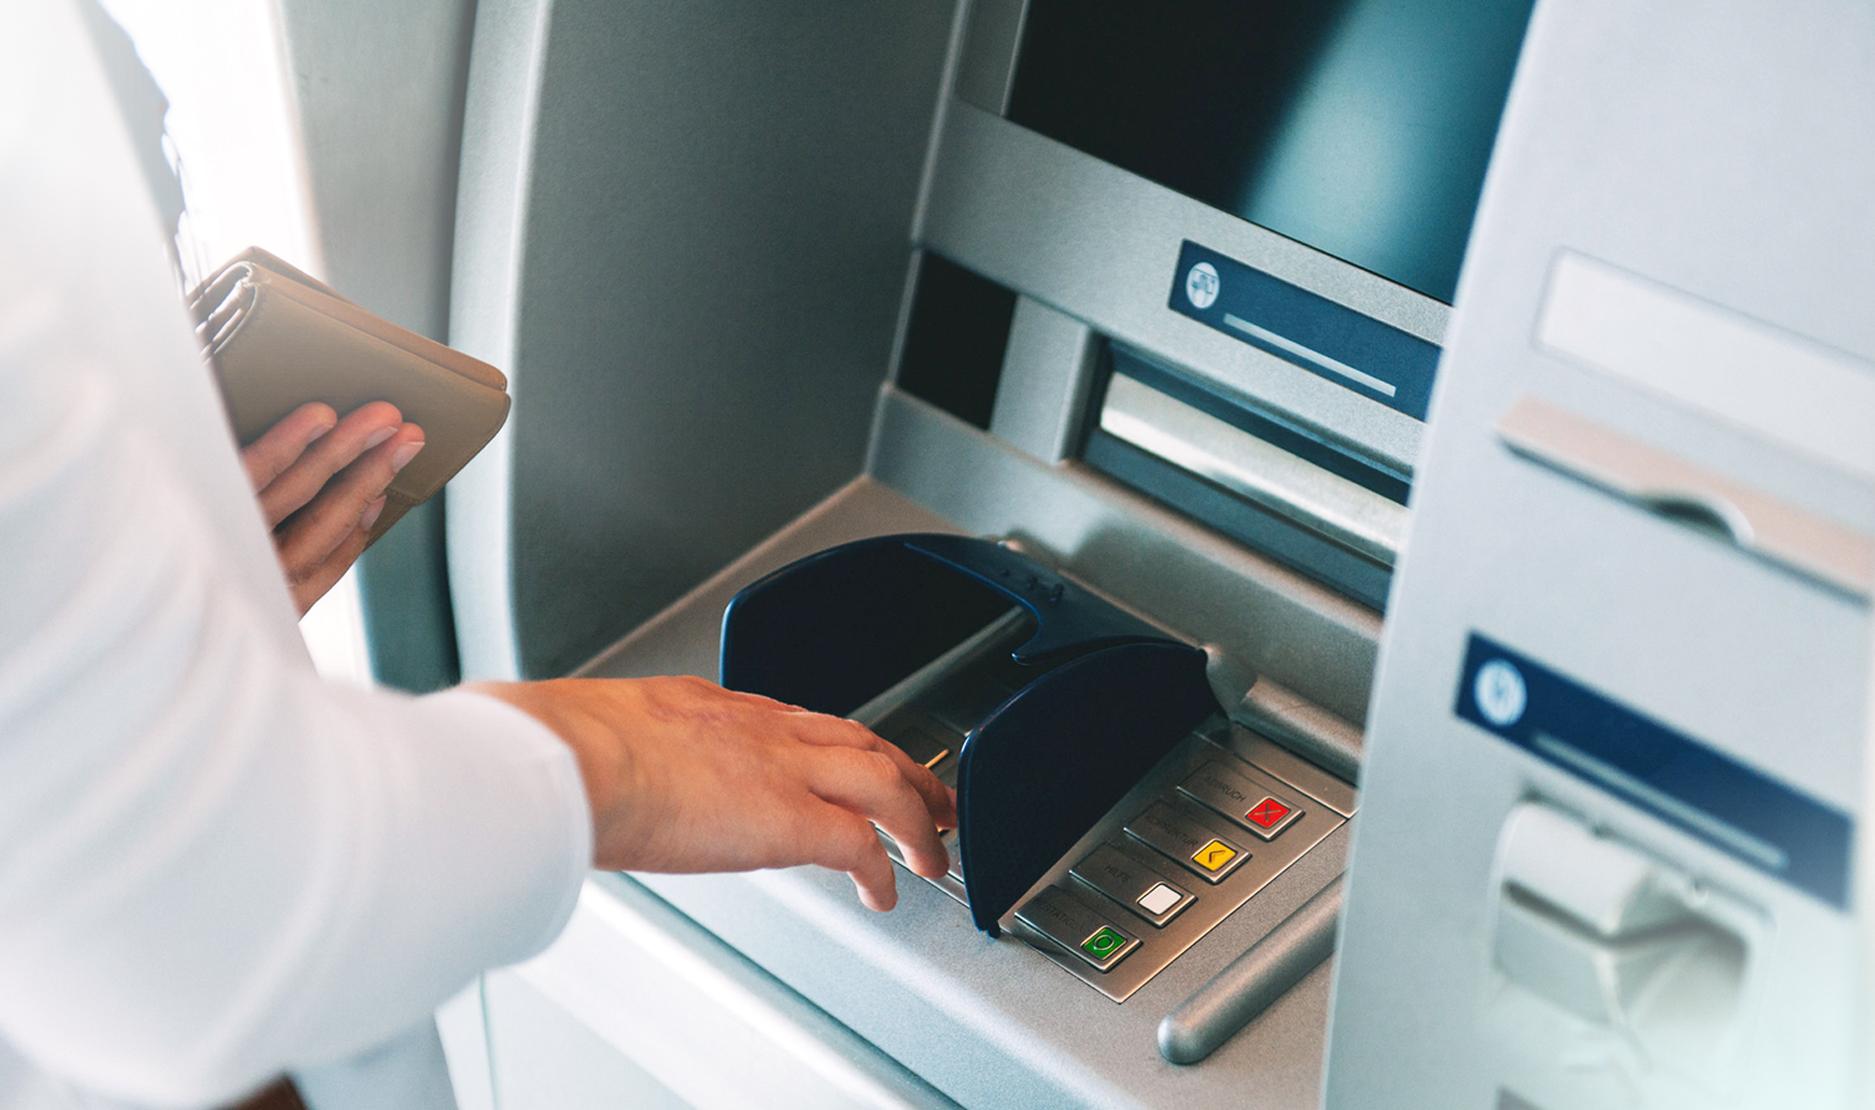 Tips Transaksi Aman di <a href='https://manado.tribunnews.com/tag/atm' title='ATM'>ATM</a>